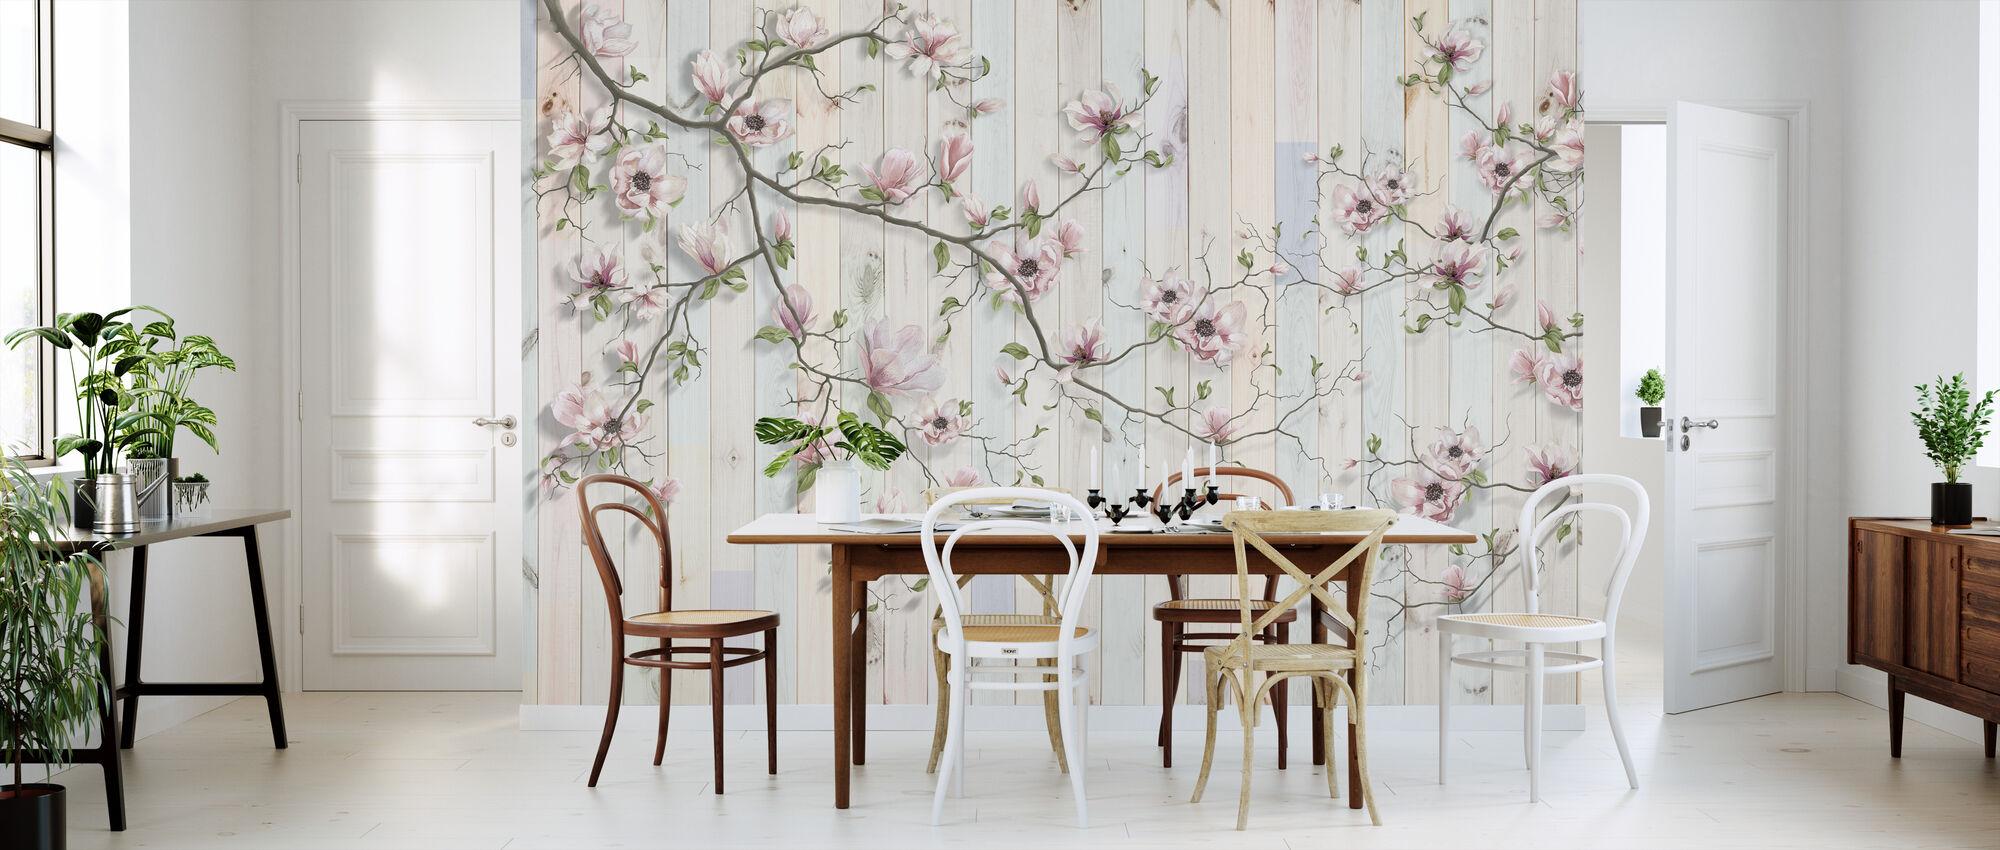 Magnolia Plank Wall - Wallpaper - Kitchen